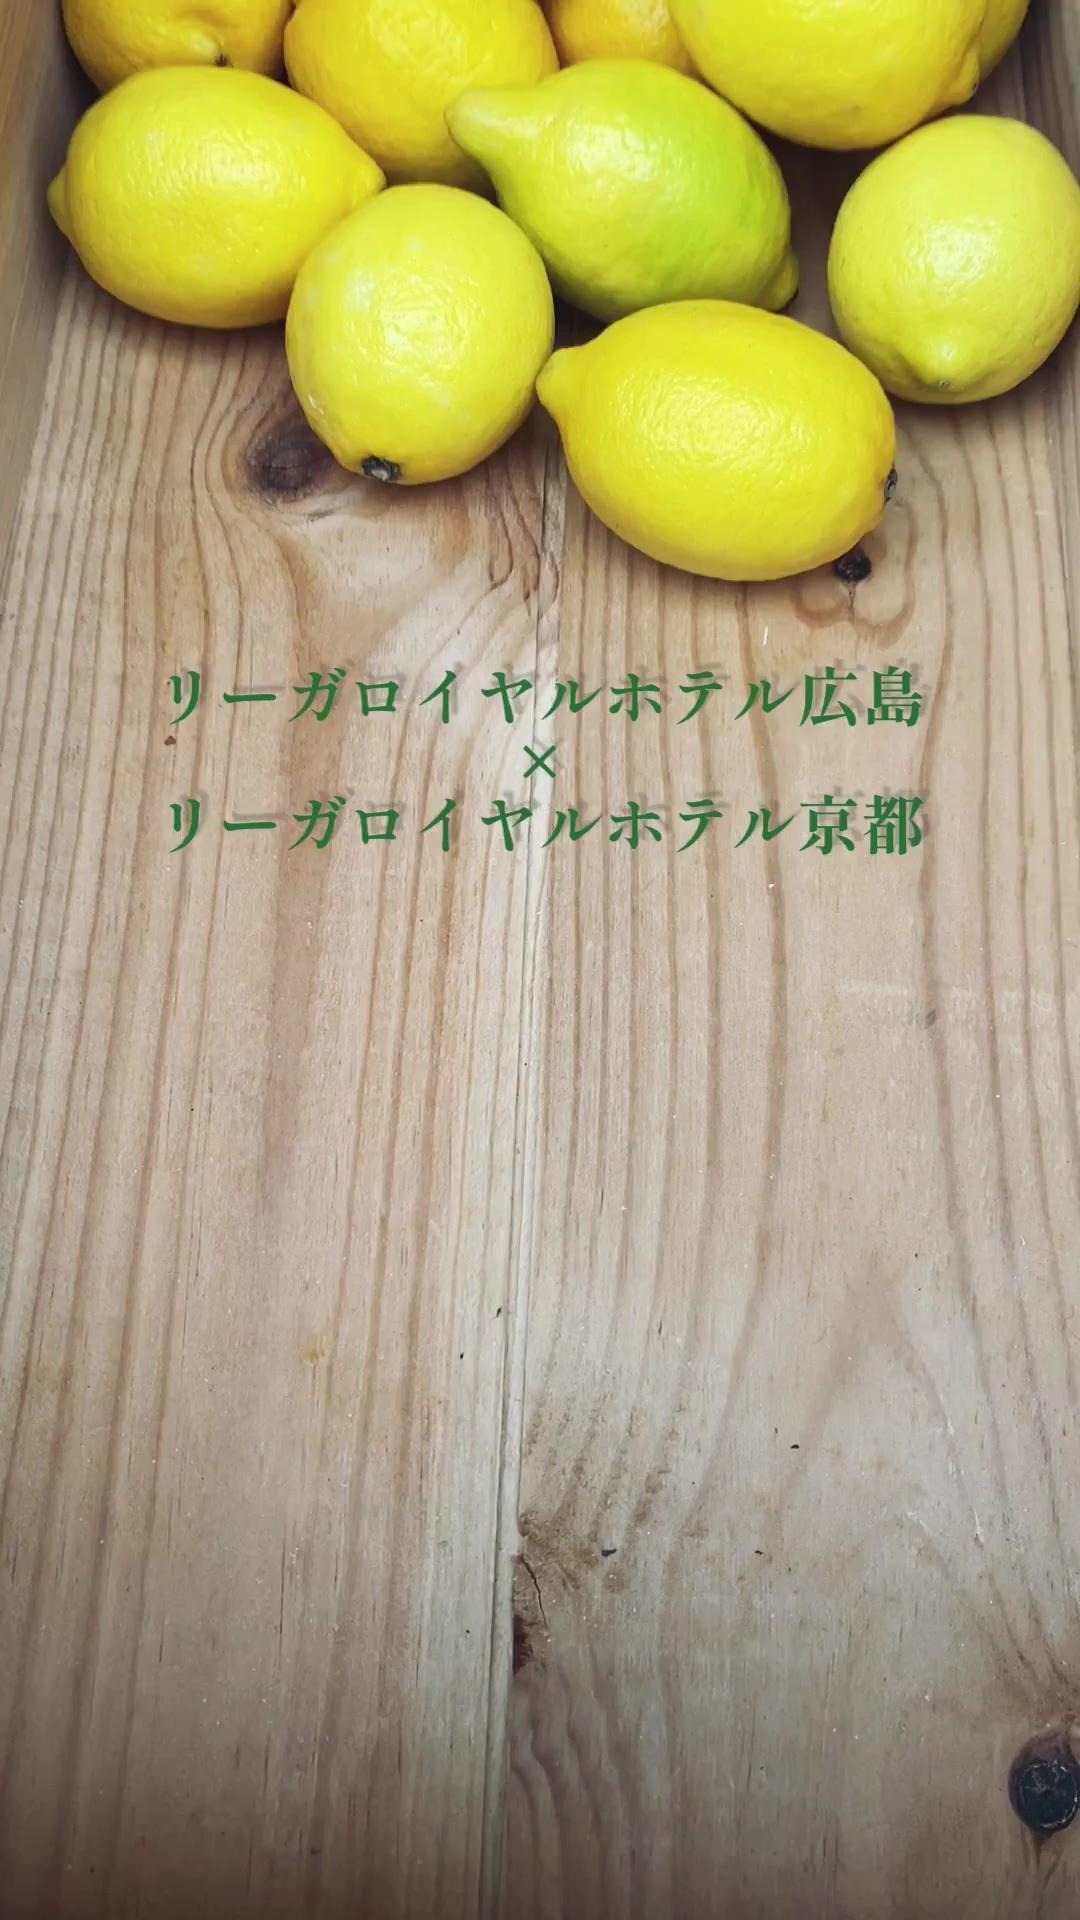 hiroshima-lemon_op